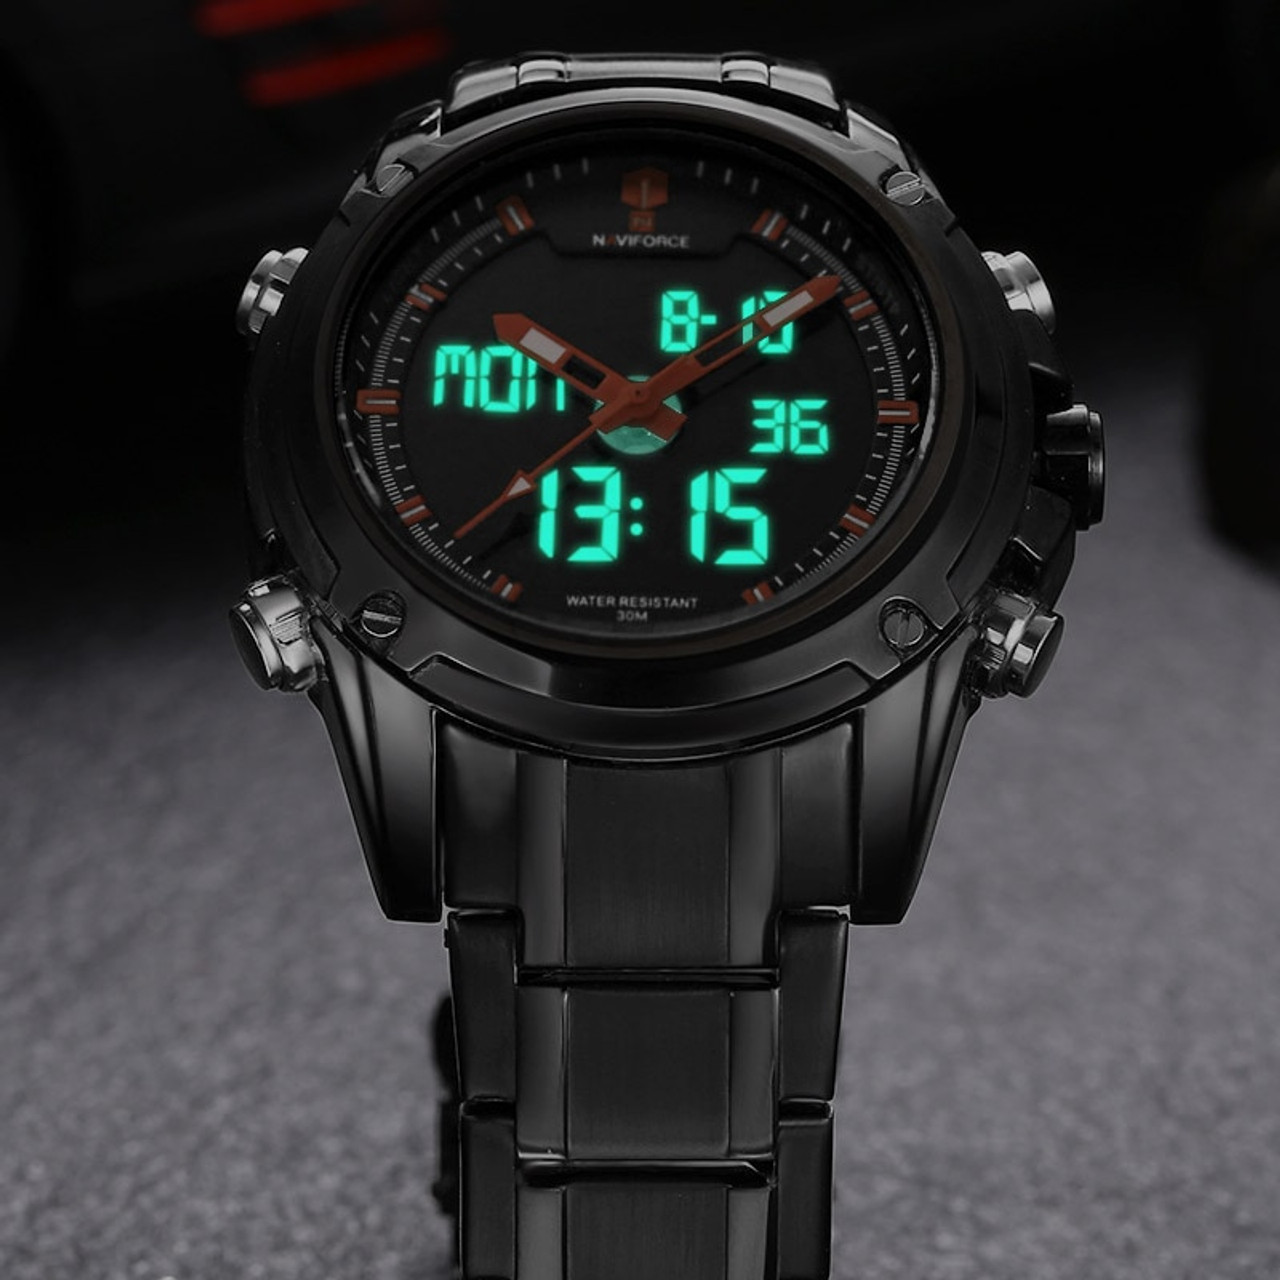 24f5f341b ... Top Men Watches Luxury Brand Naviforce Men's Quartz Hour Analog LED  Sports Watch Men Army Military ...